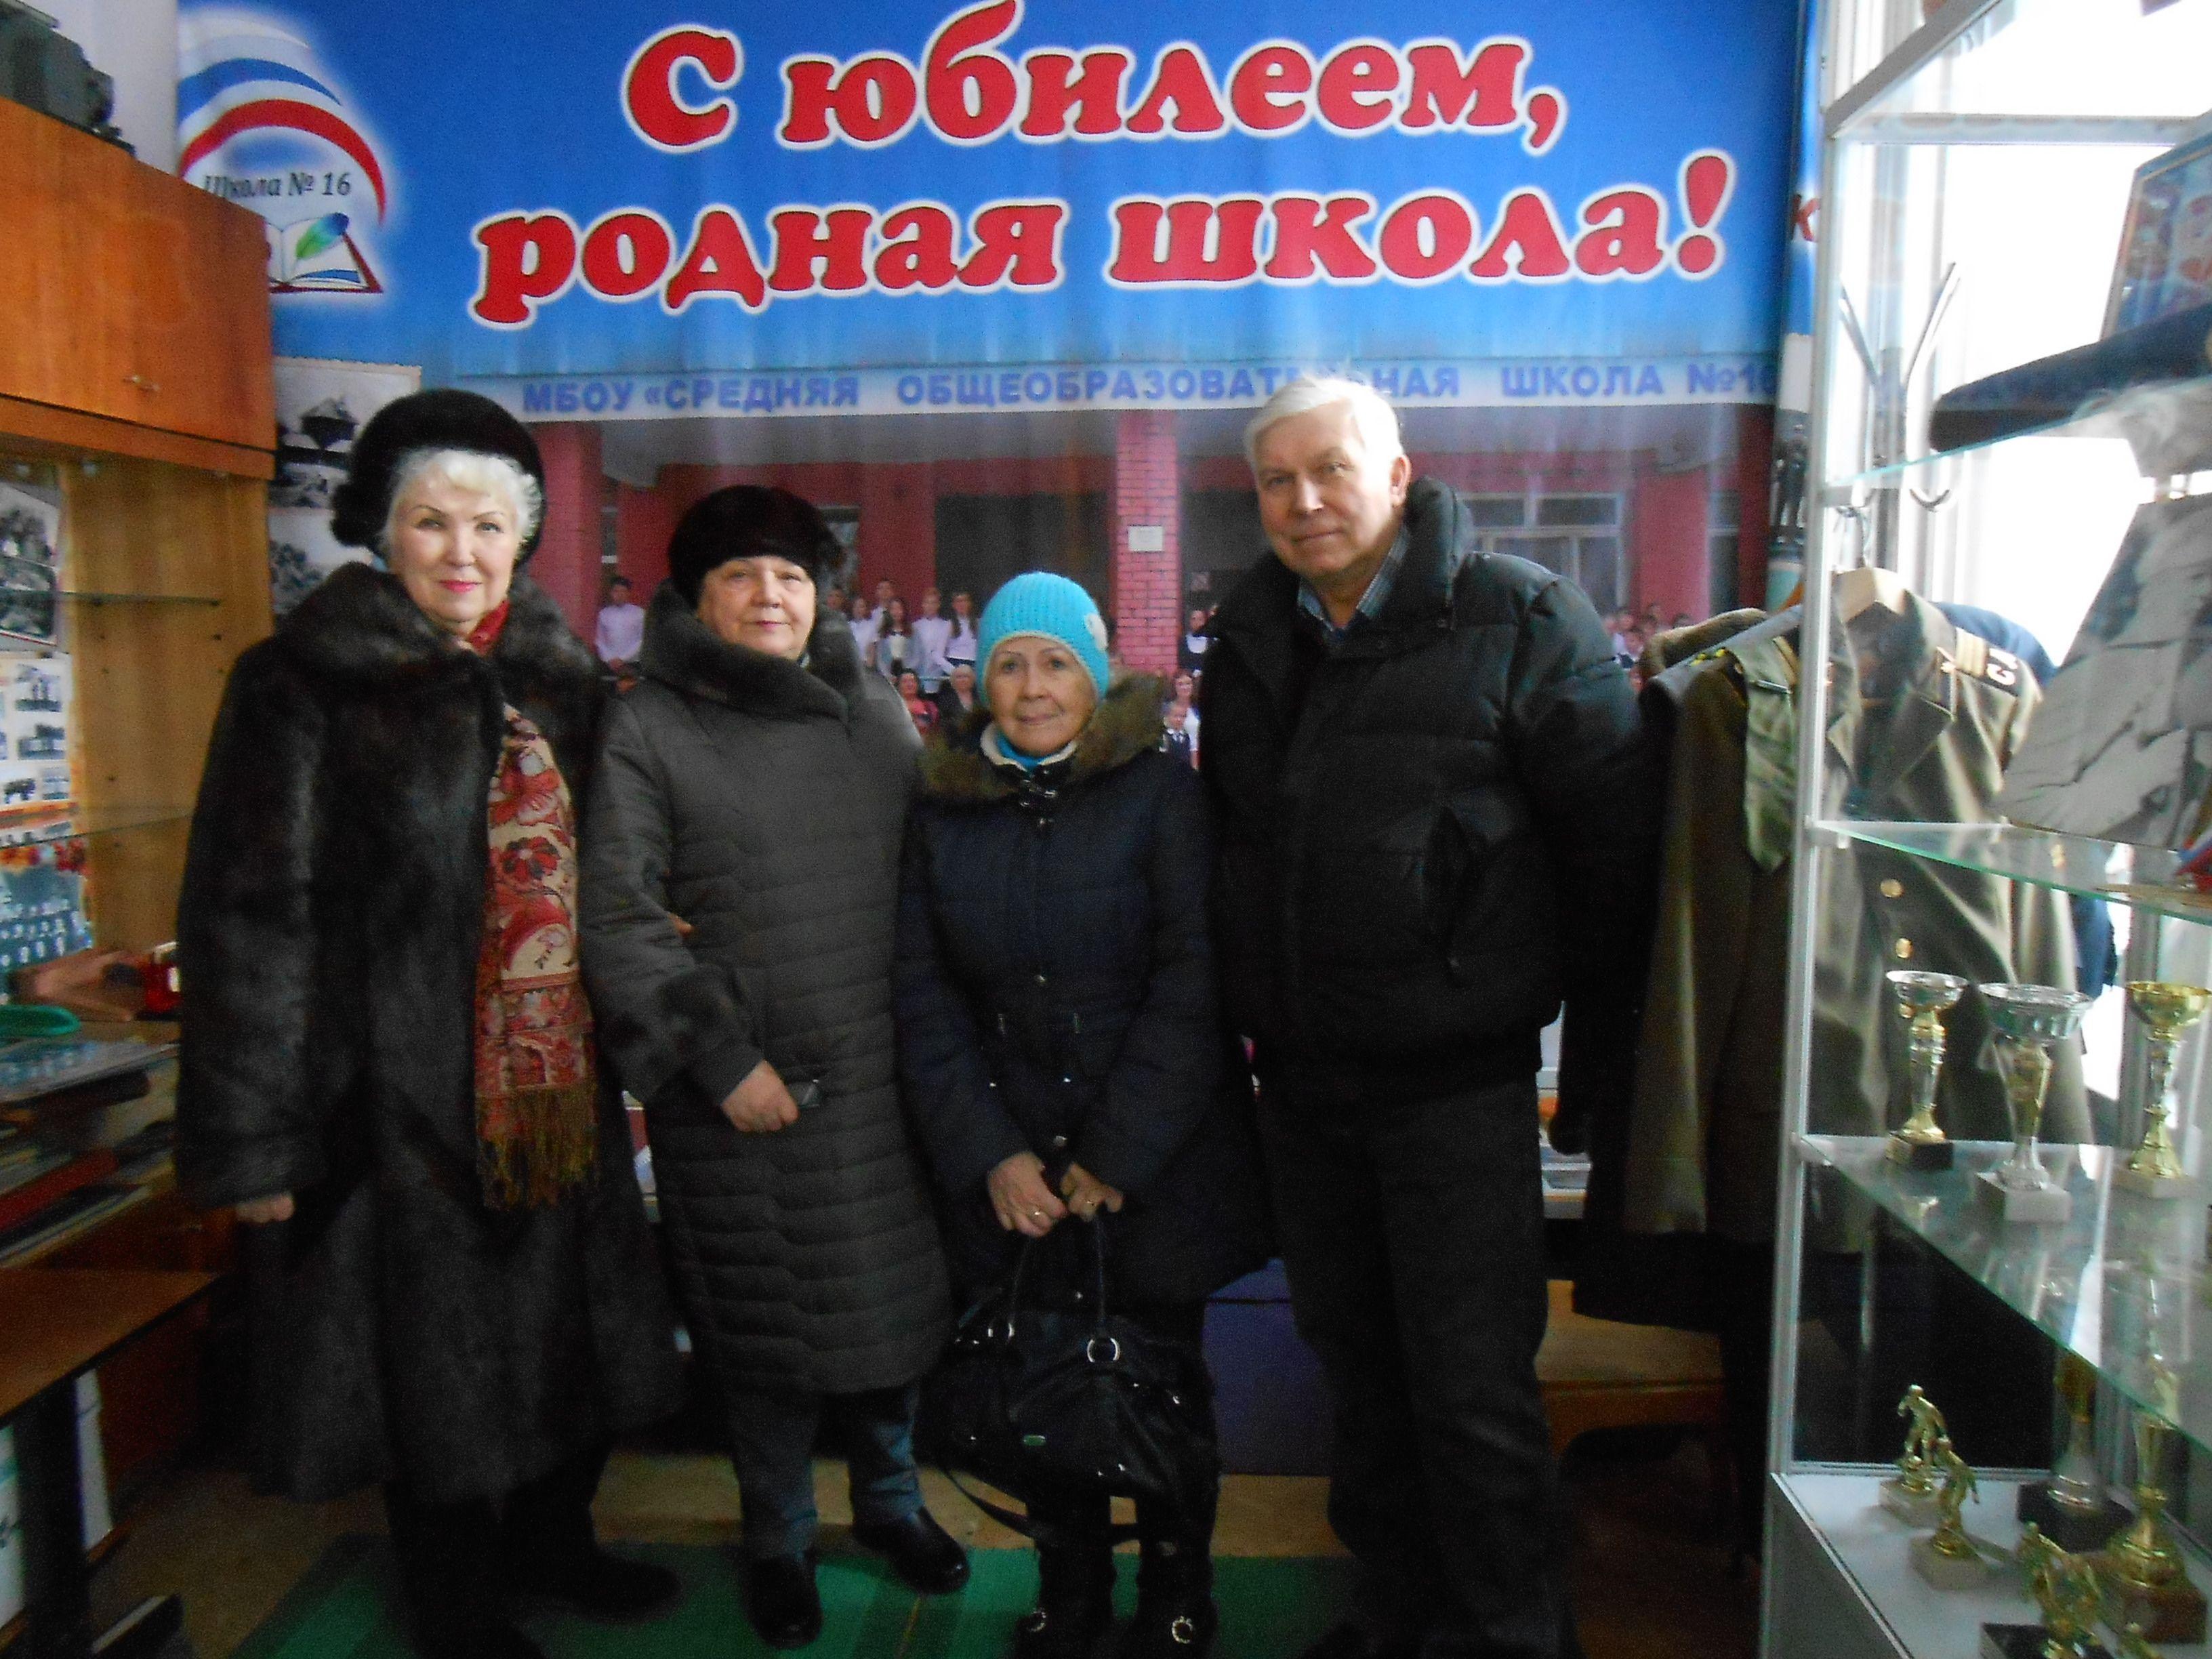 Ю.Ф. Камшилин и одноклассницы